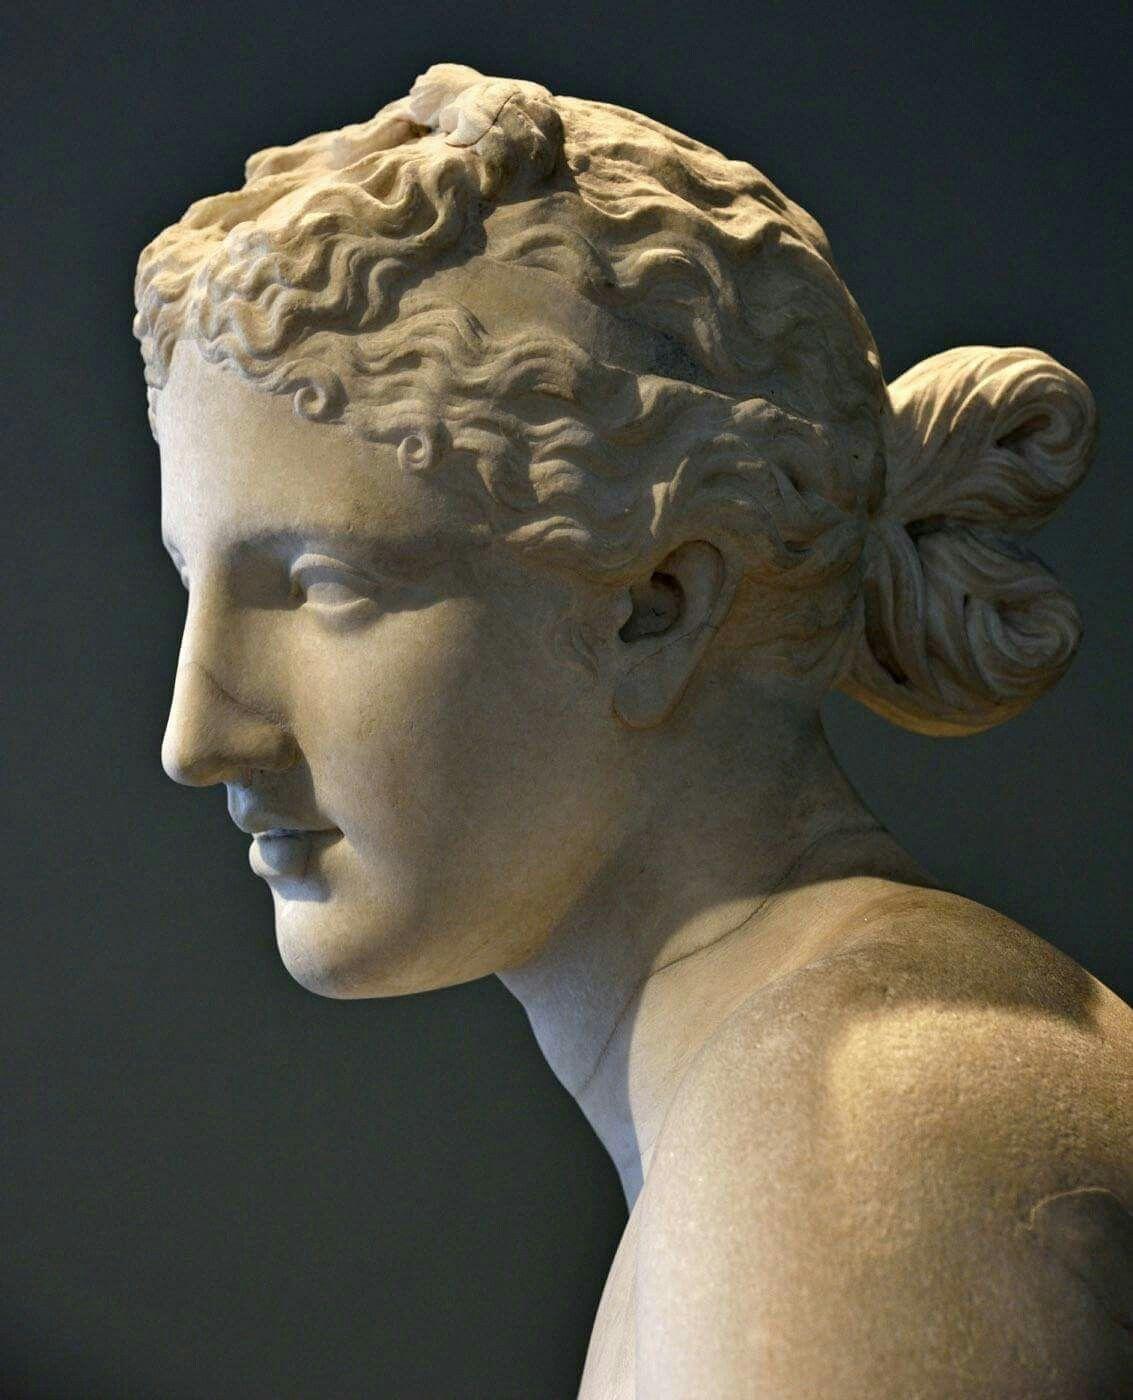 Aphrodite priestessess shaved head